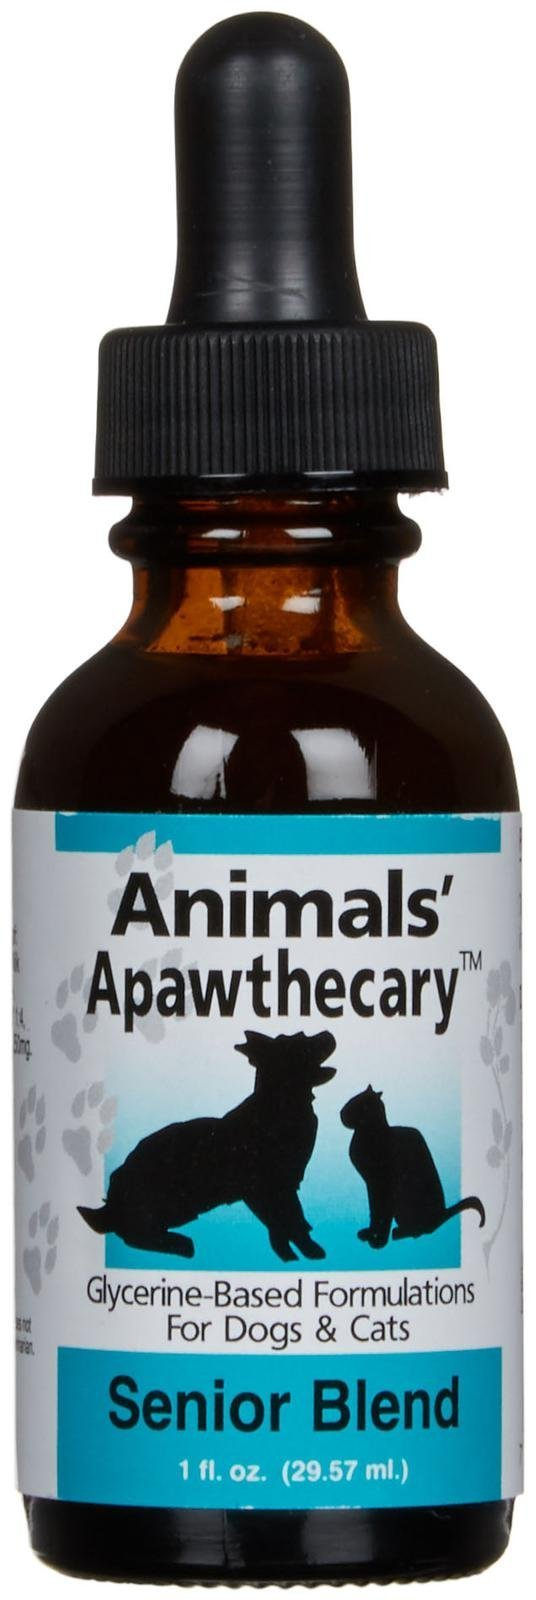 Animal Essentials Inc Apawthecary Senior Blend, 1 fl. oz